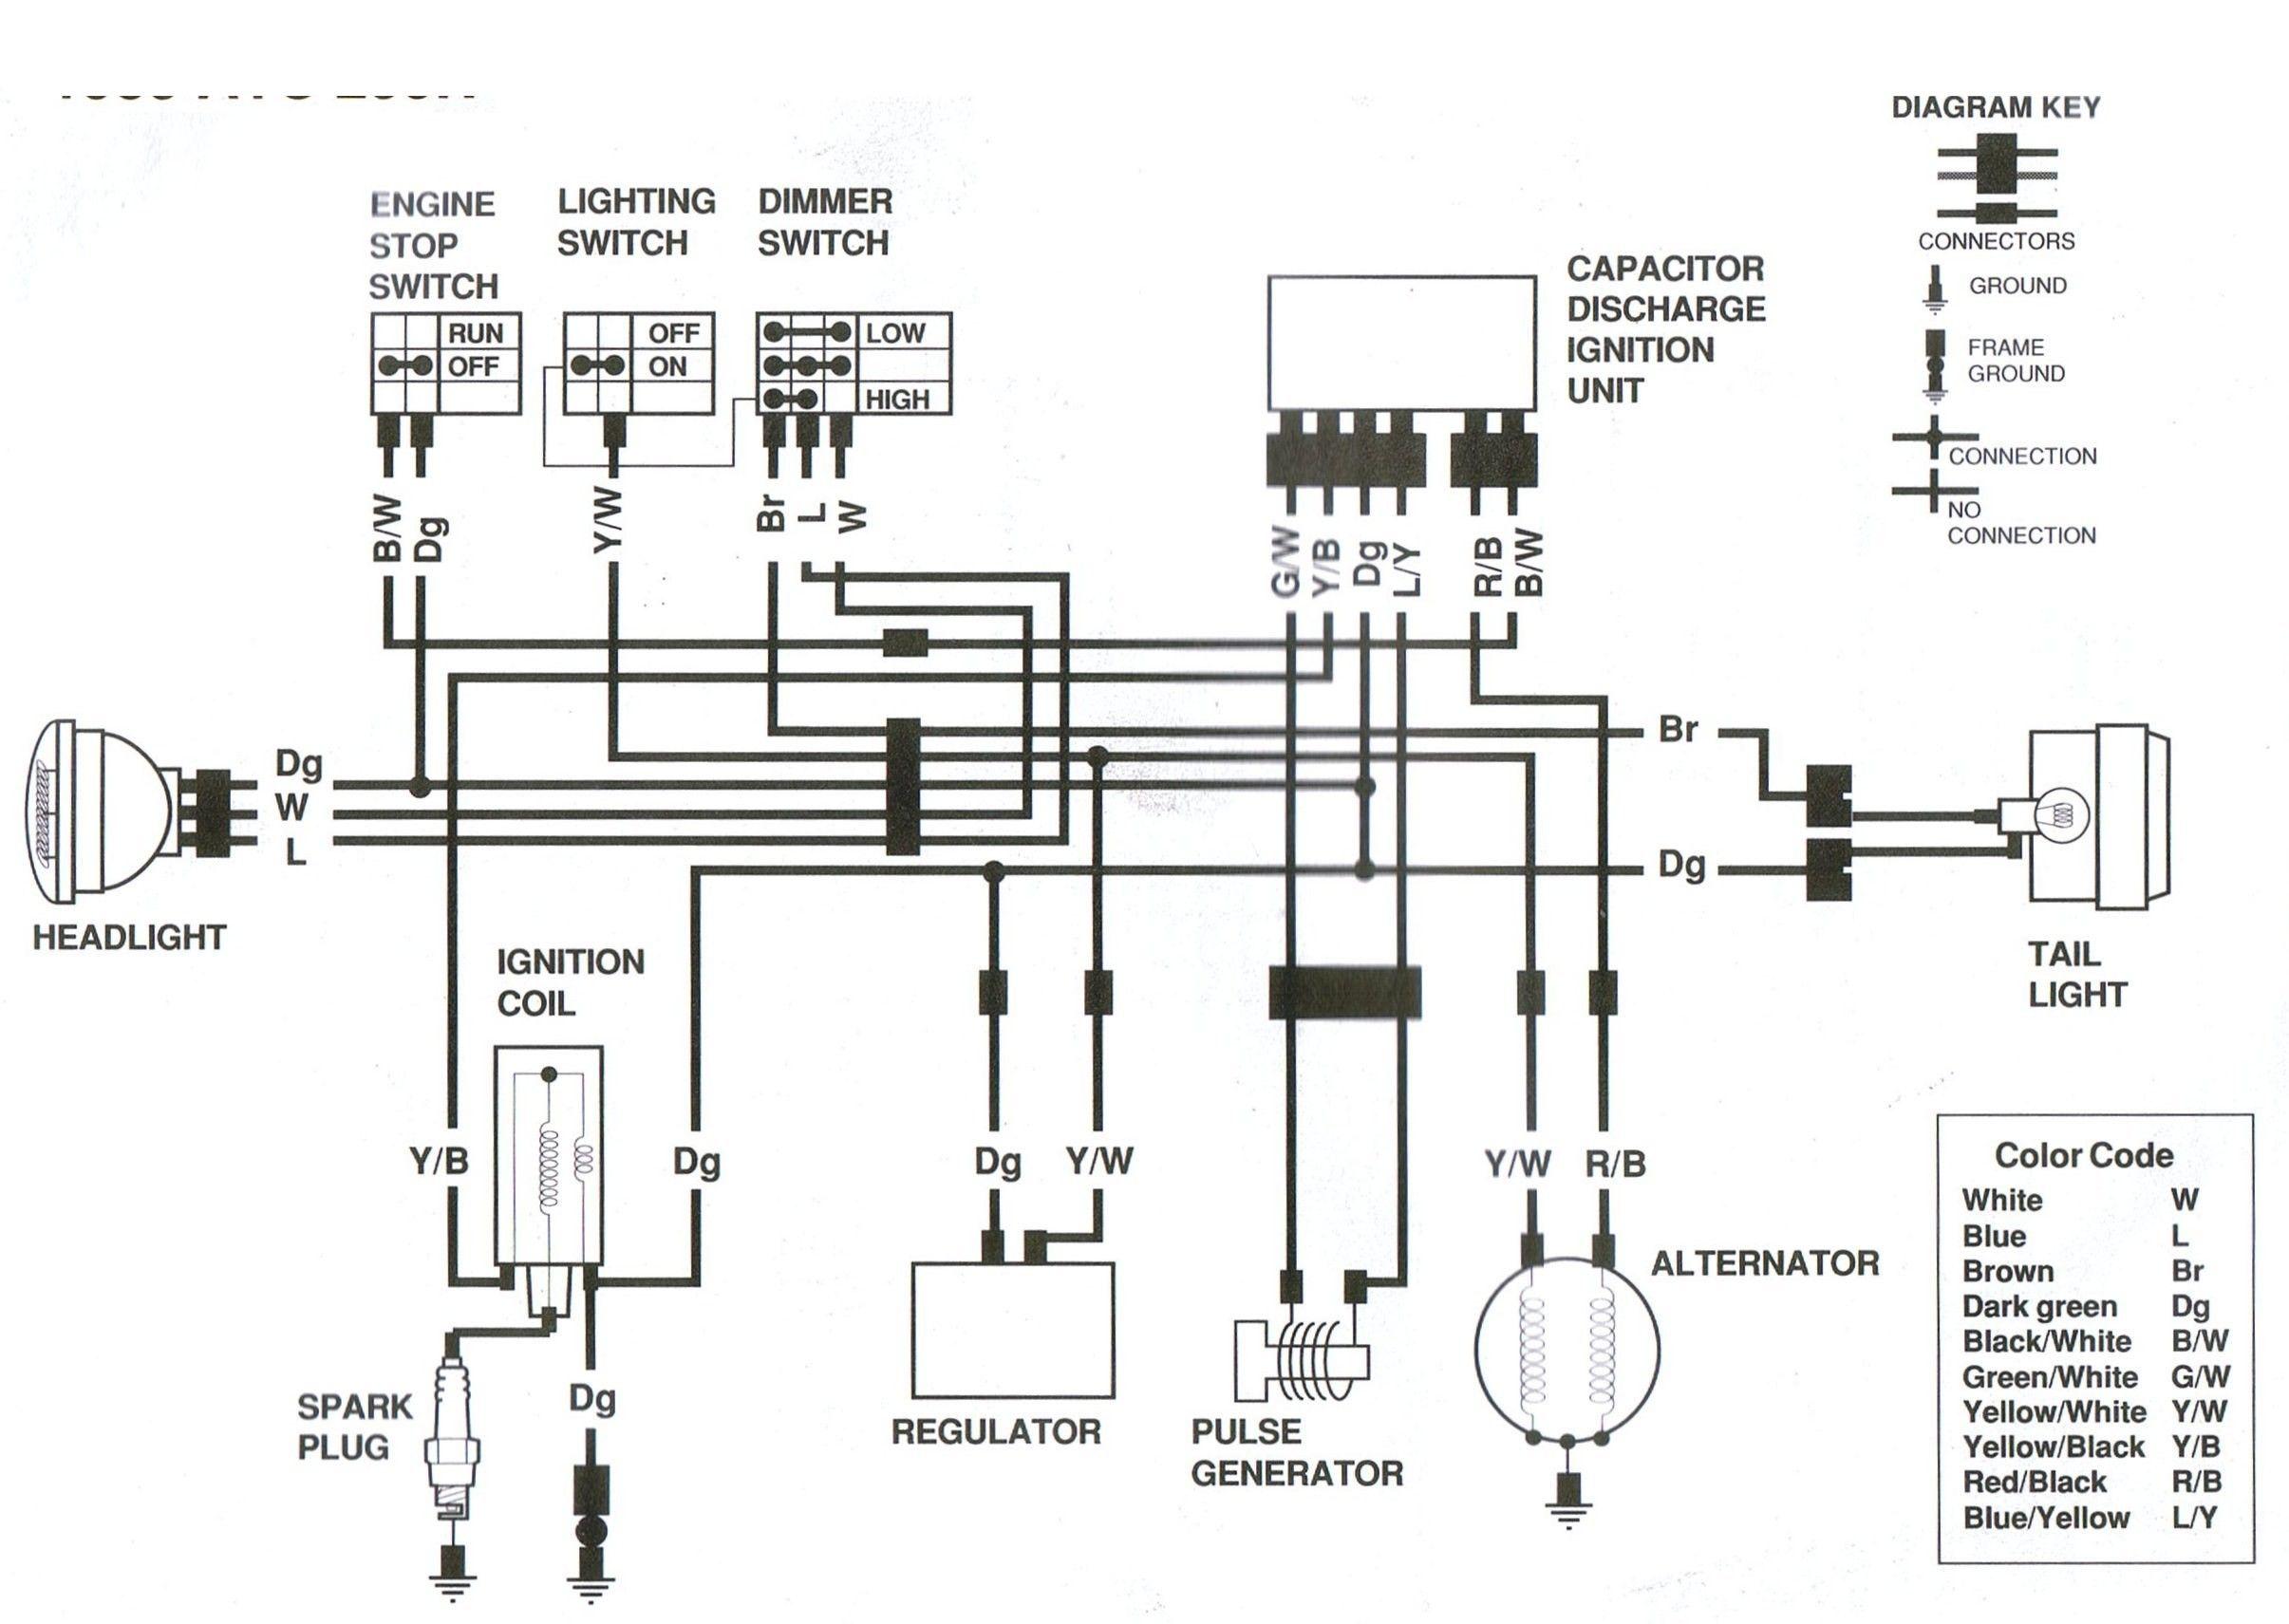 Wiring Diagram For Yamaha Big Bear 350Ebook Databases